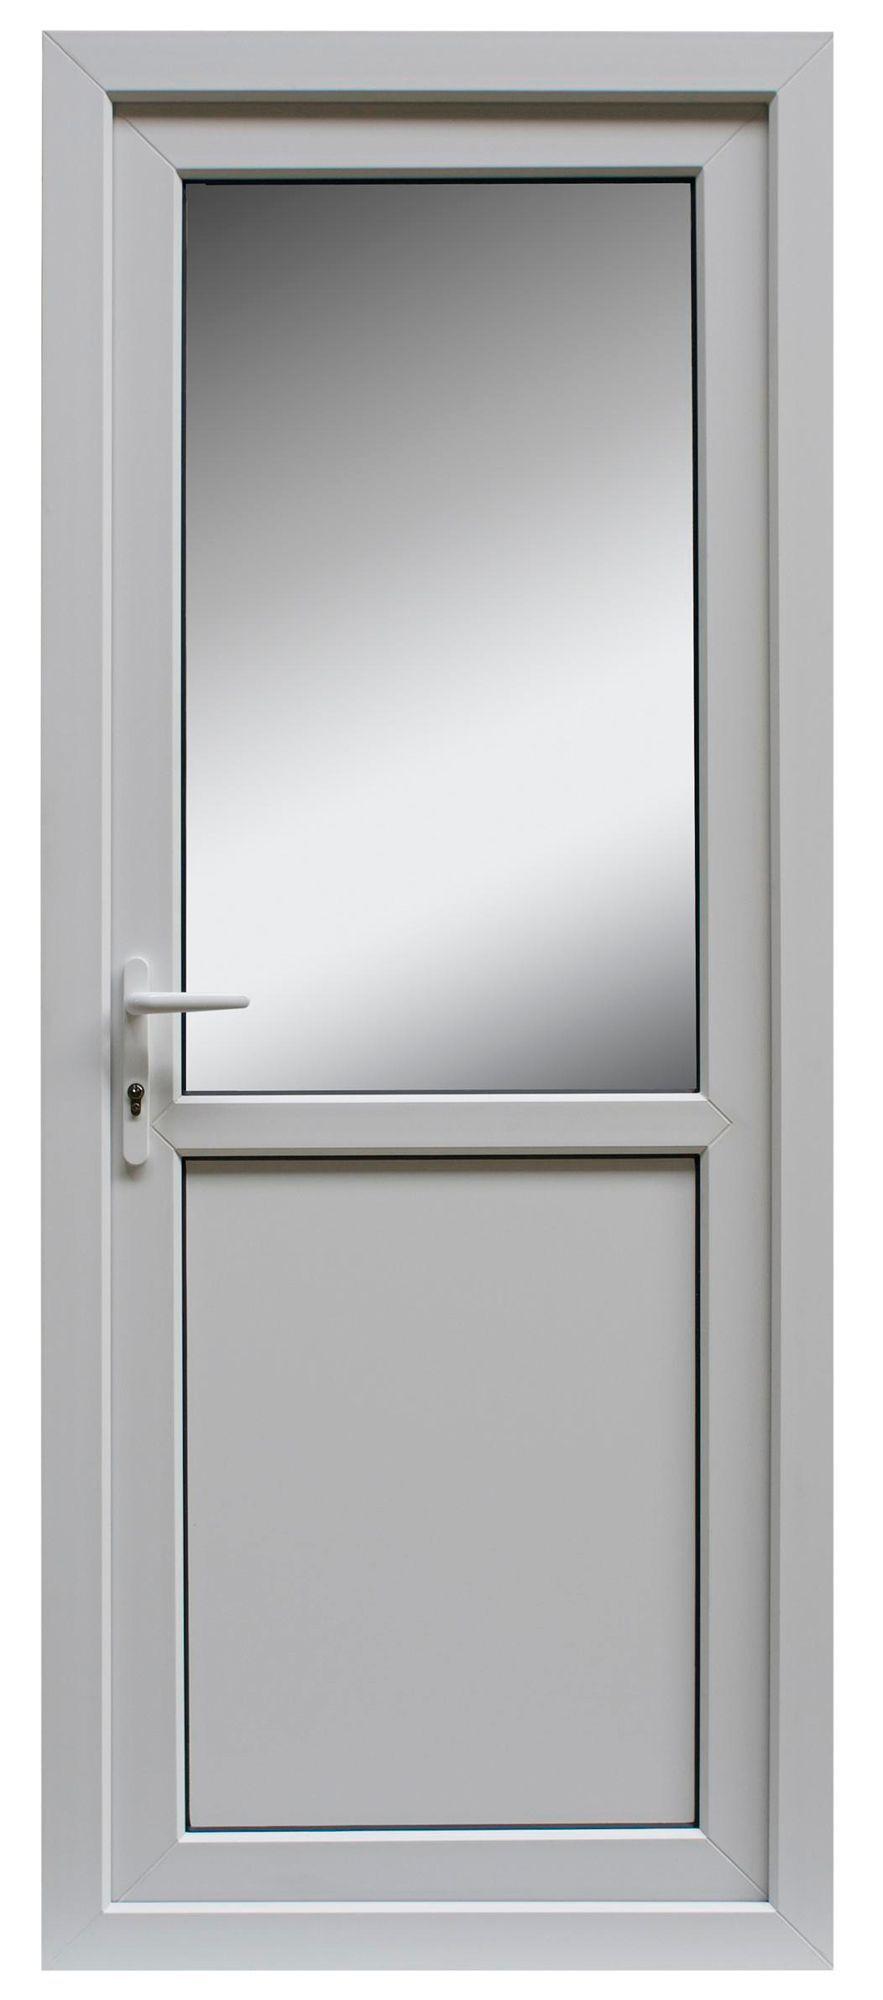 1 Panel Pvcu White Pvcu Glazed Back Door & Frame Rh, (h)2055mm (w)840mm